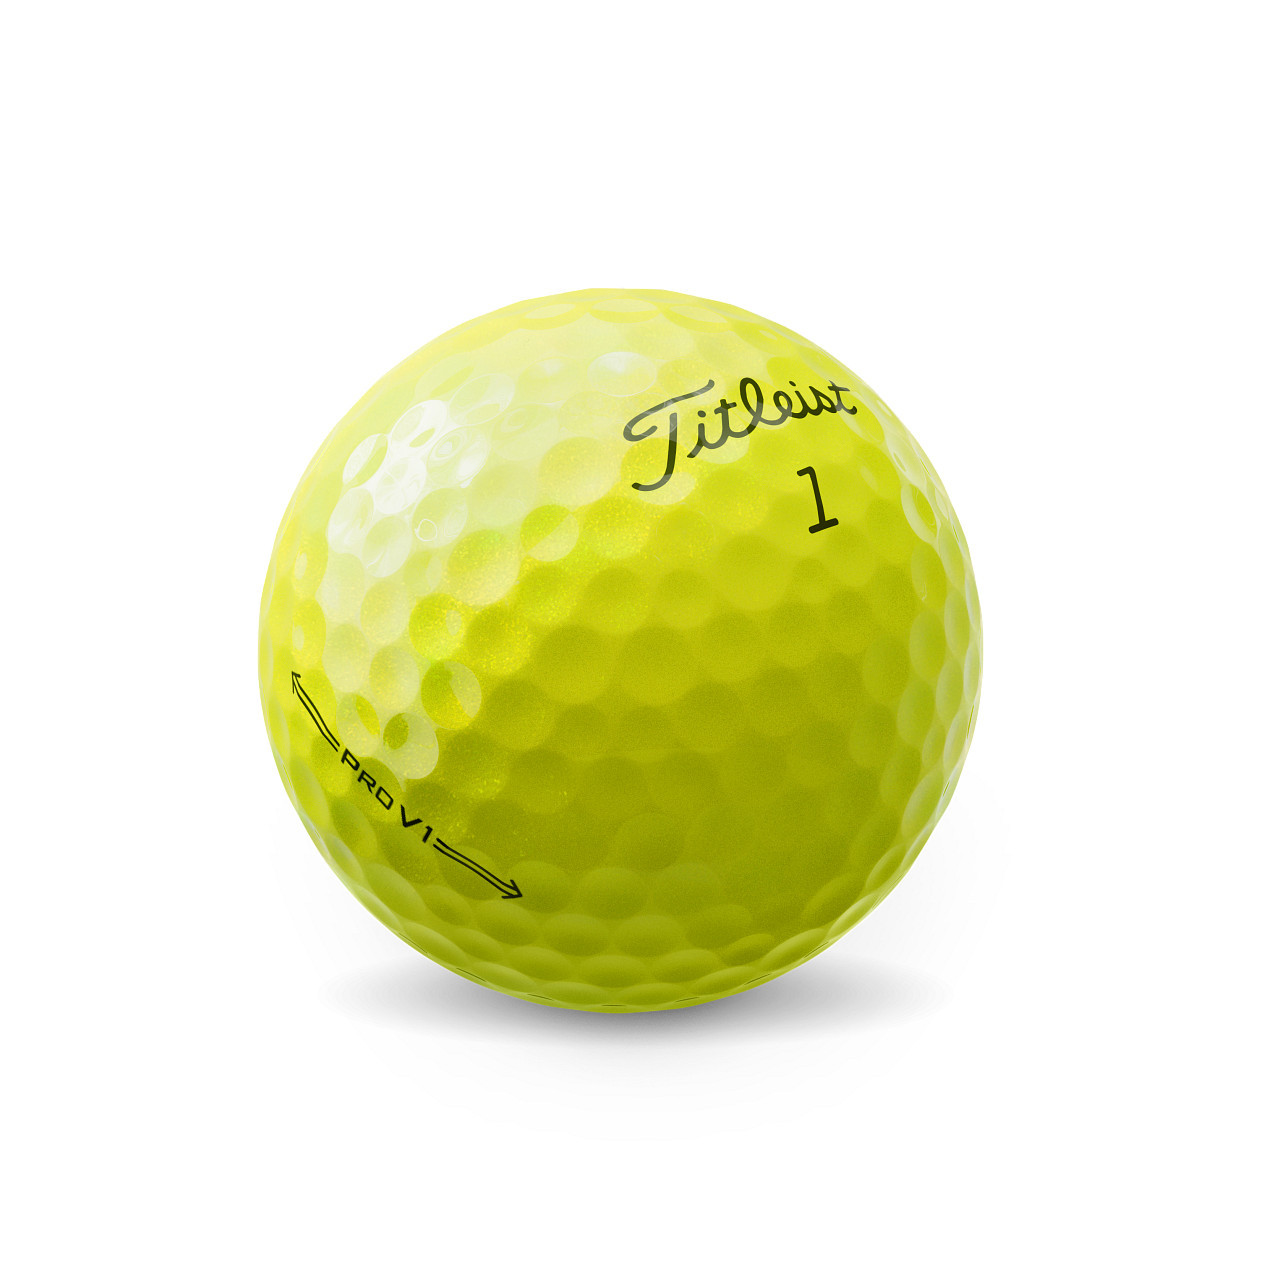 Titleist Personalized Pro V1 Yellow Dozen Golf Balls 2021